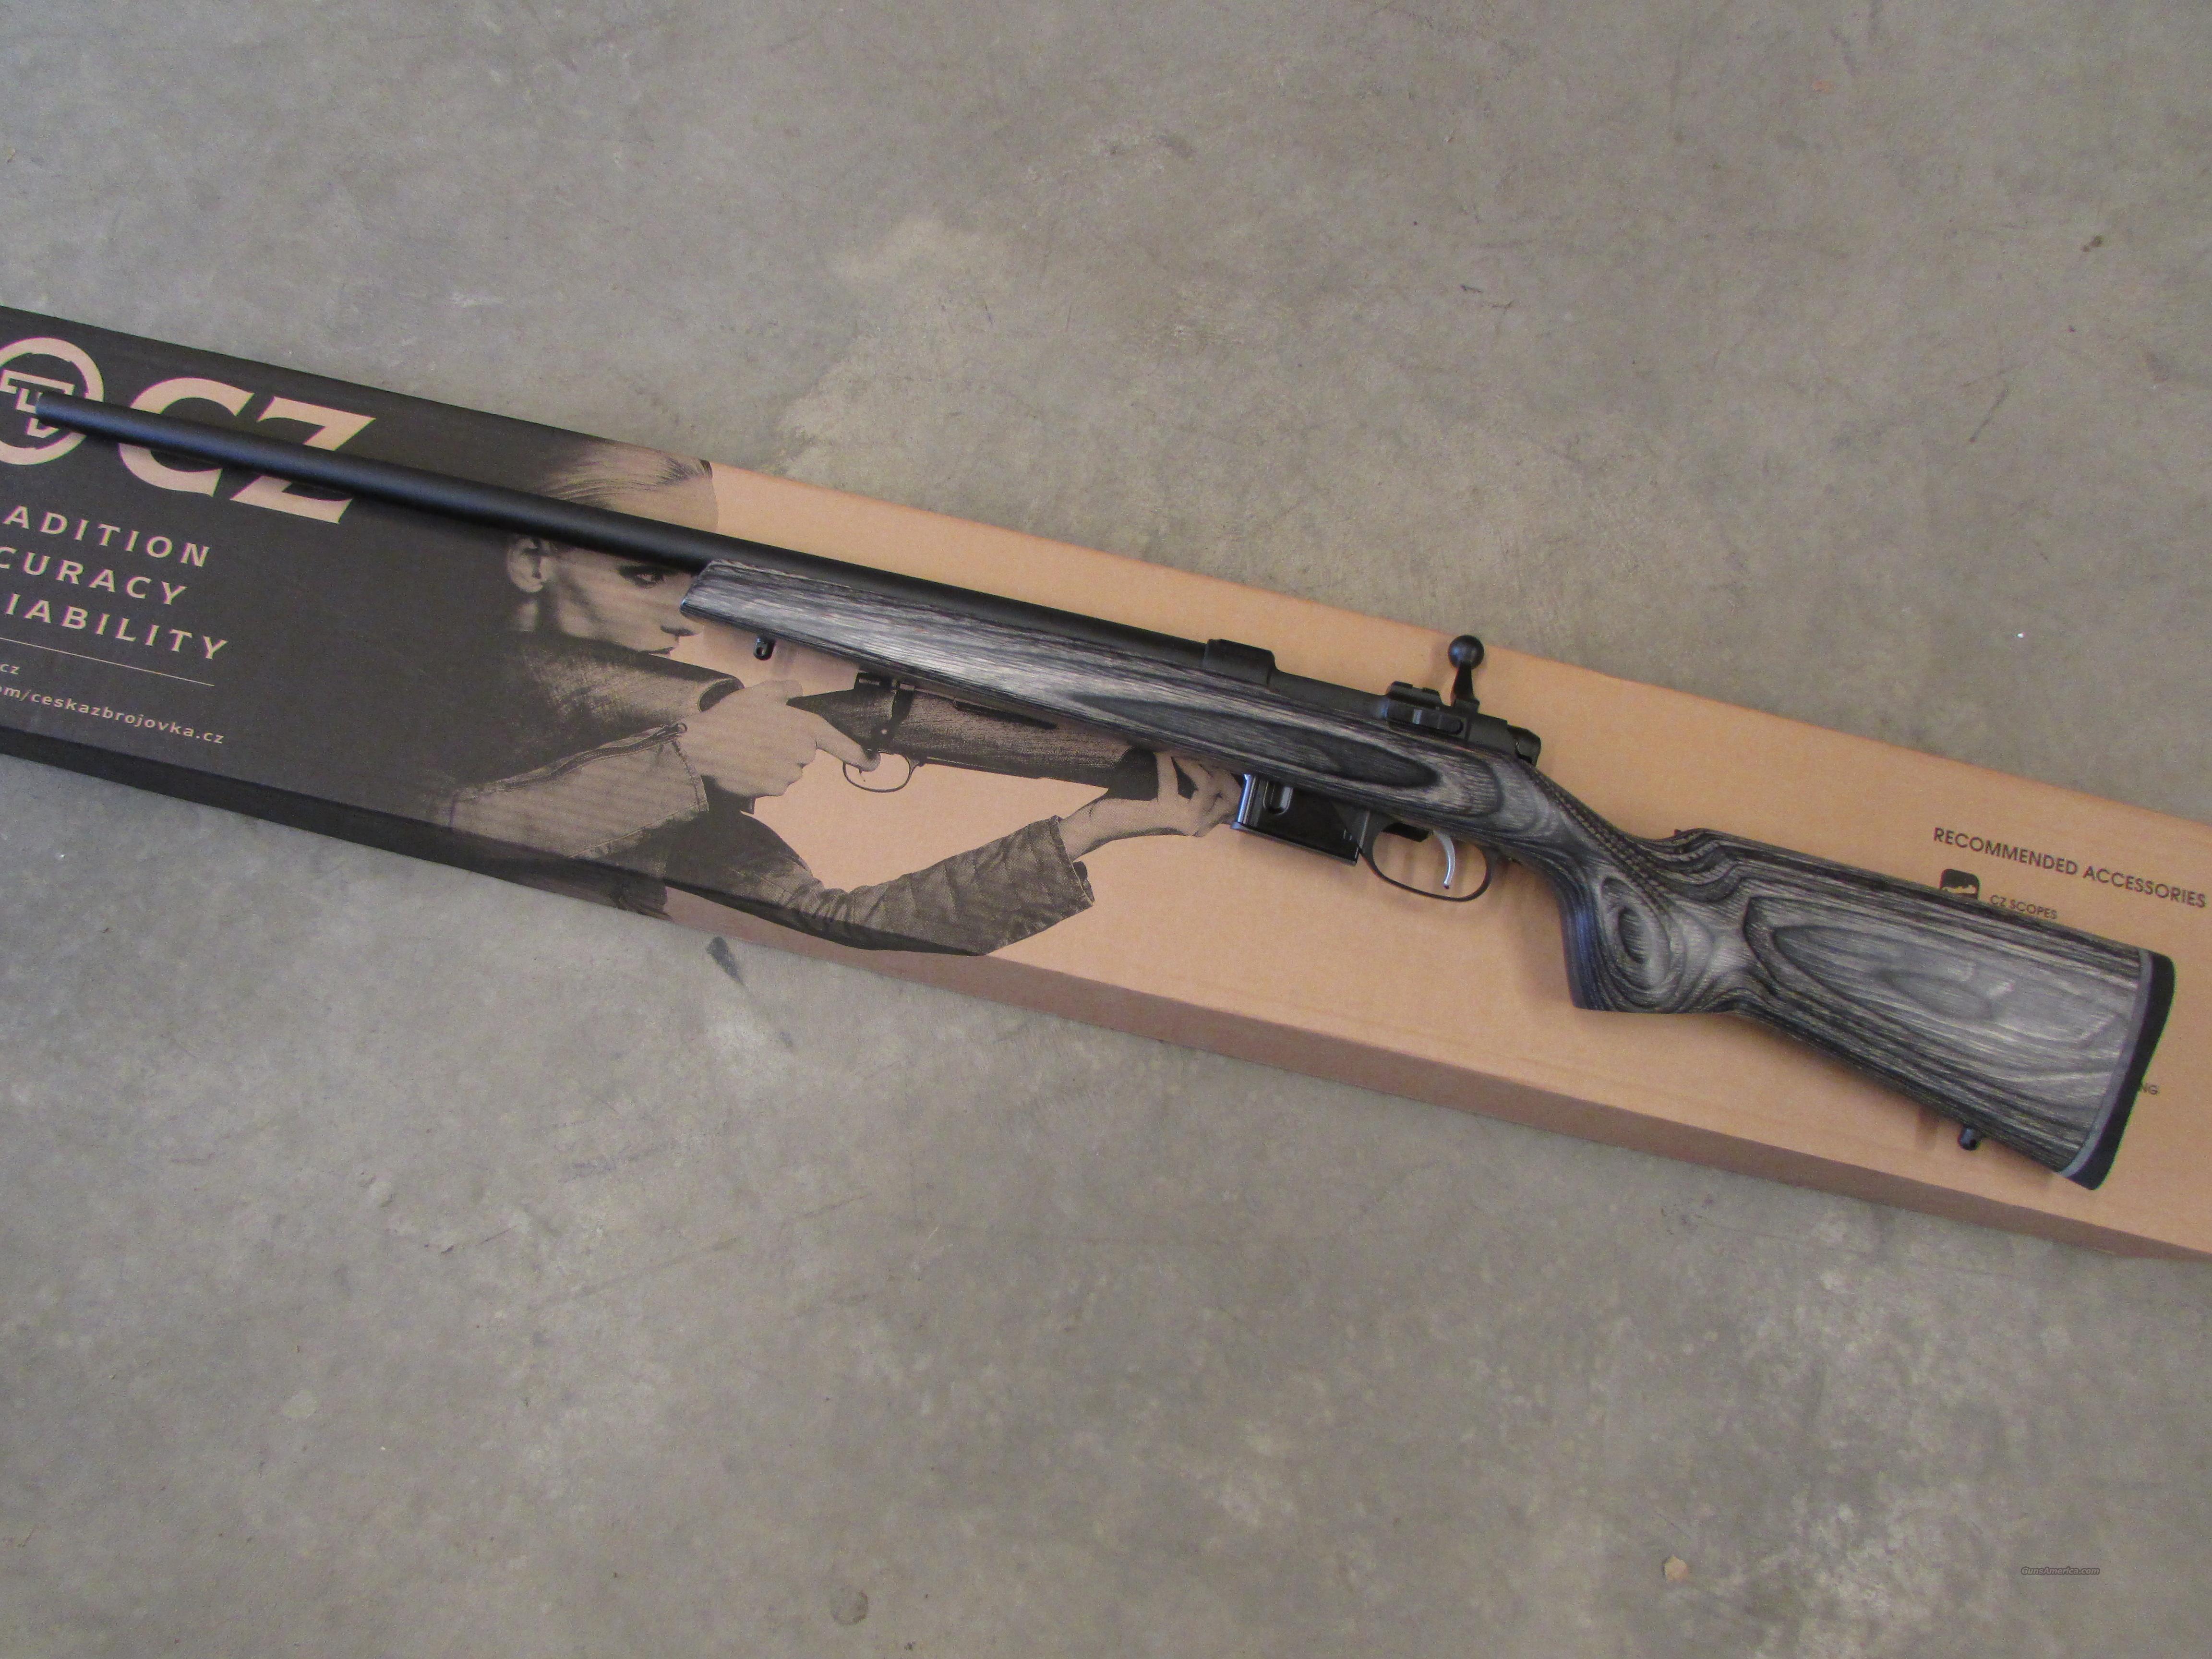 CZ .17 Hornet 527 Varmint Laminate Thumbhole Grey Rifle For Sale